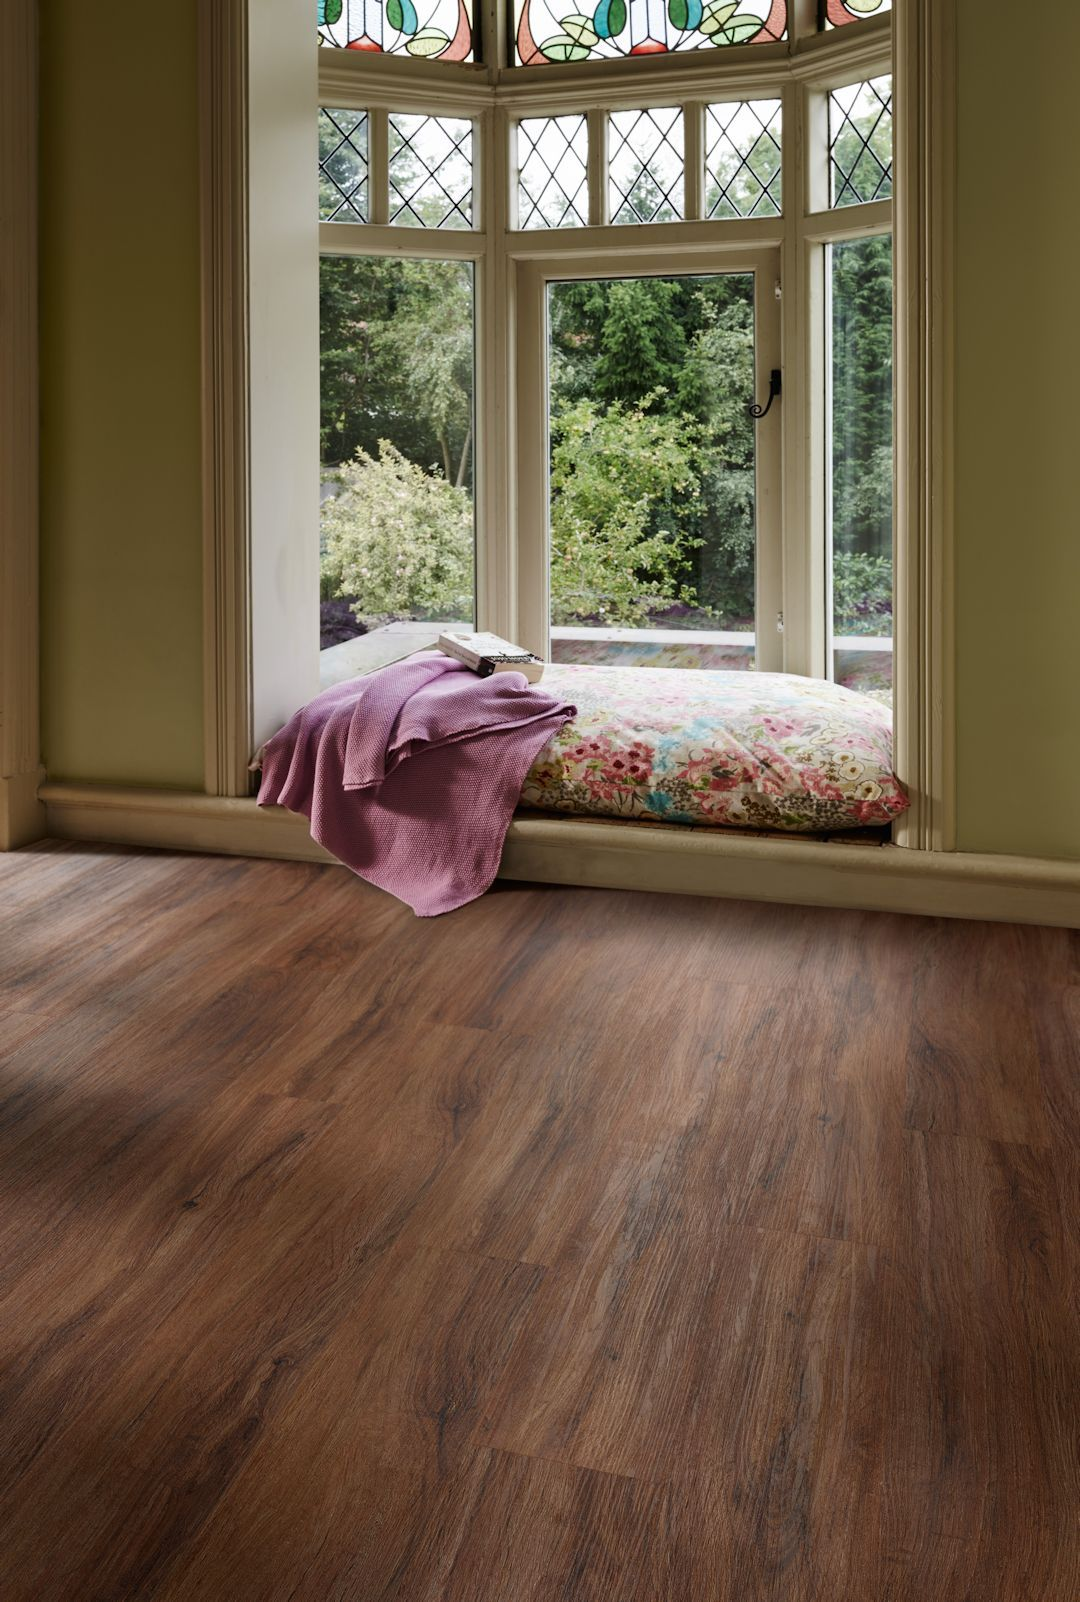 Pinterest north american walnut camaro luxury vinyl tile flooring in living room dailygadgetfo Image collections